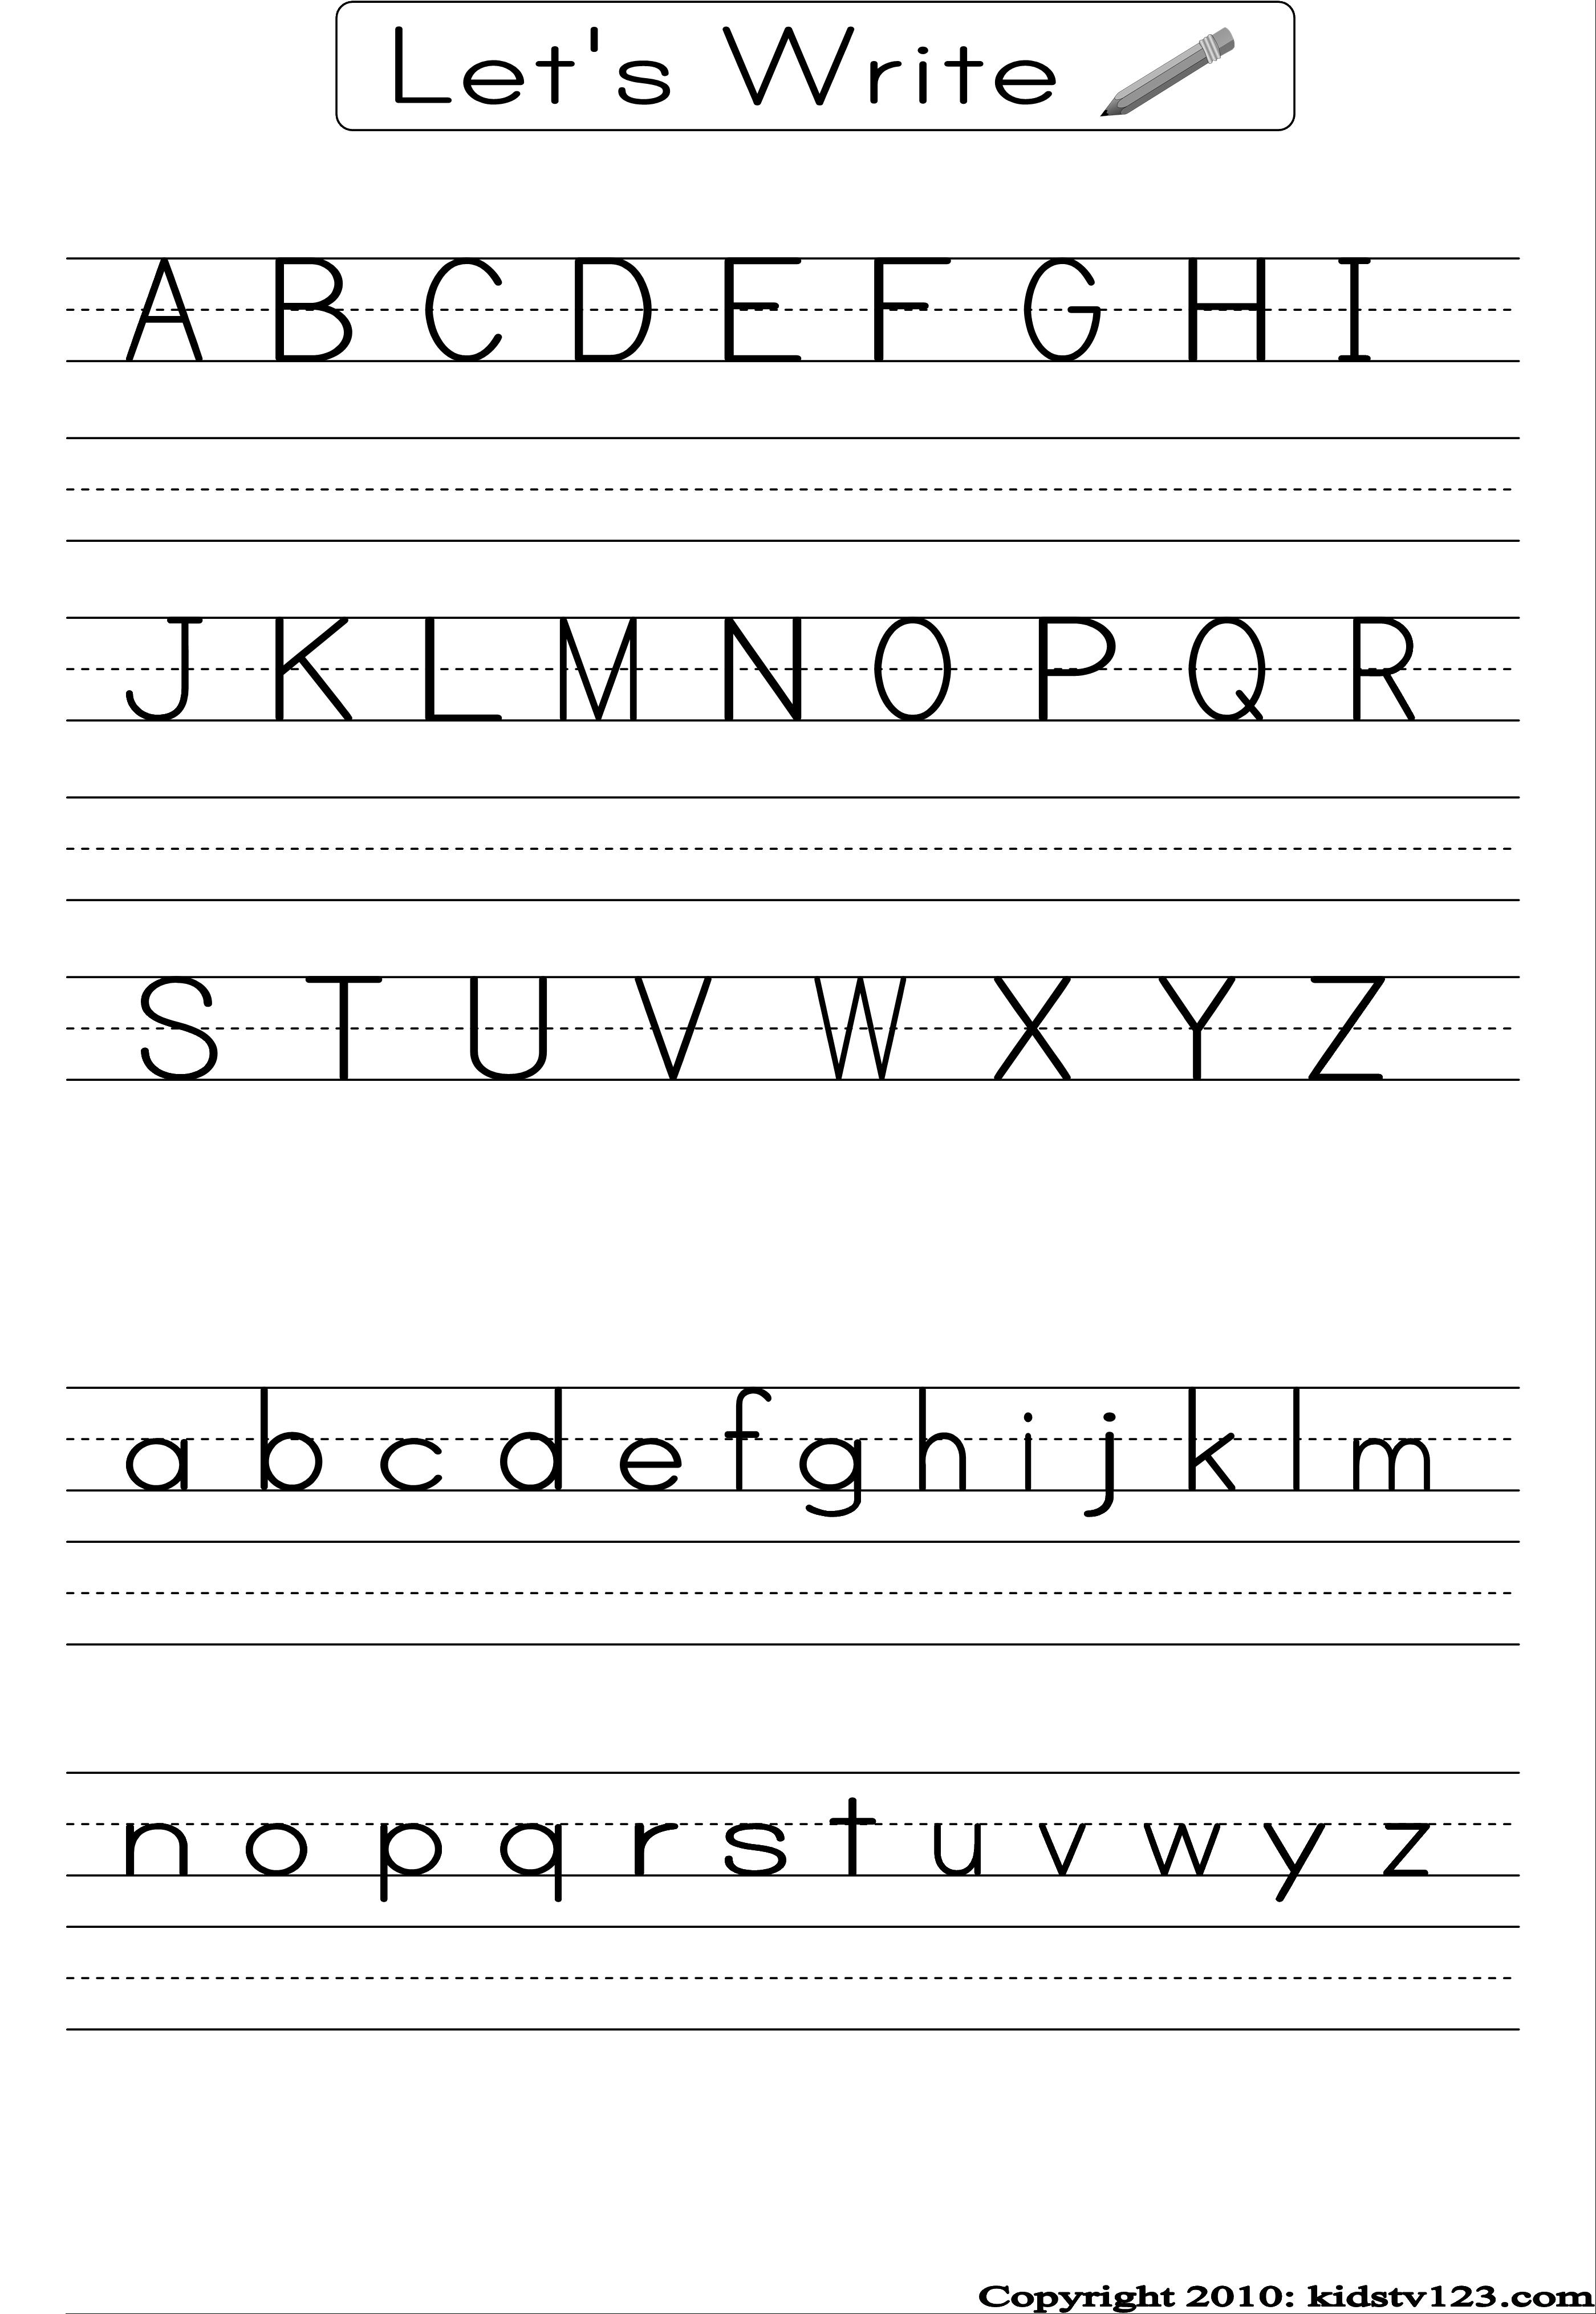 Alphabet Writing Practice Sheet | Edu-Fun | Alphabet Worksheets - Free Printable Writing Worksheets